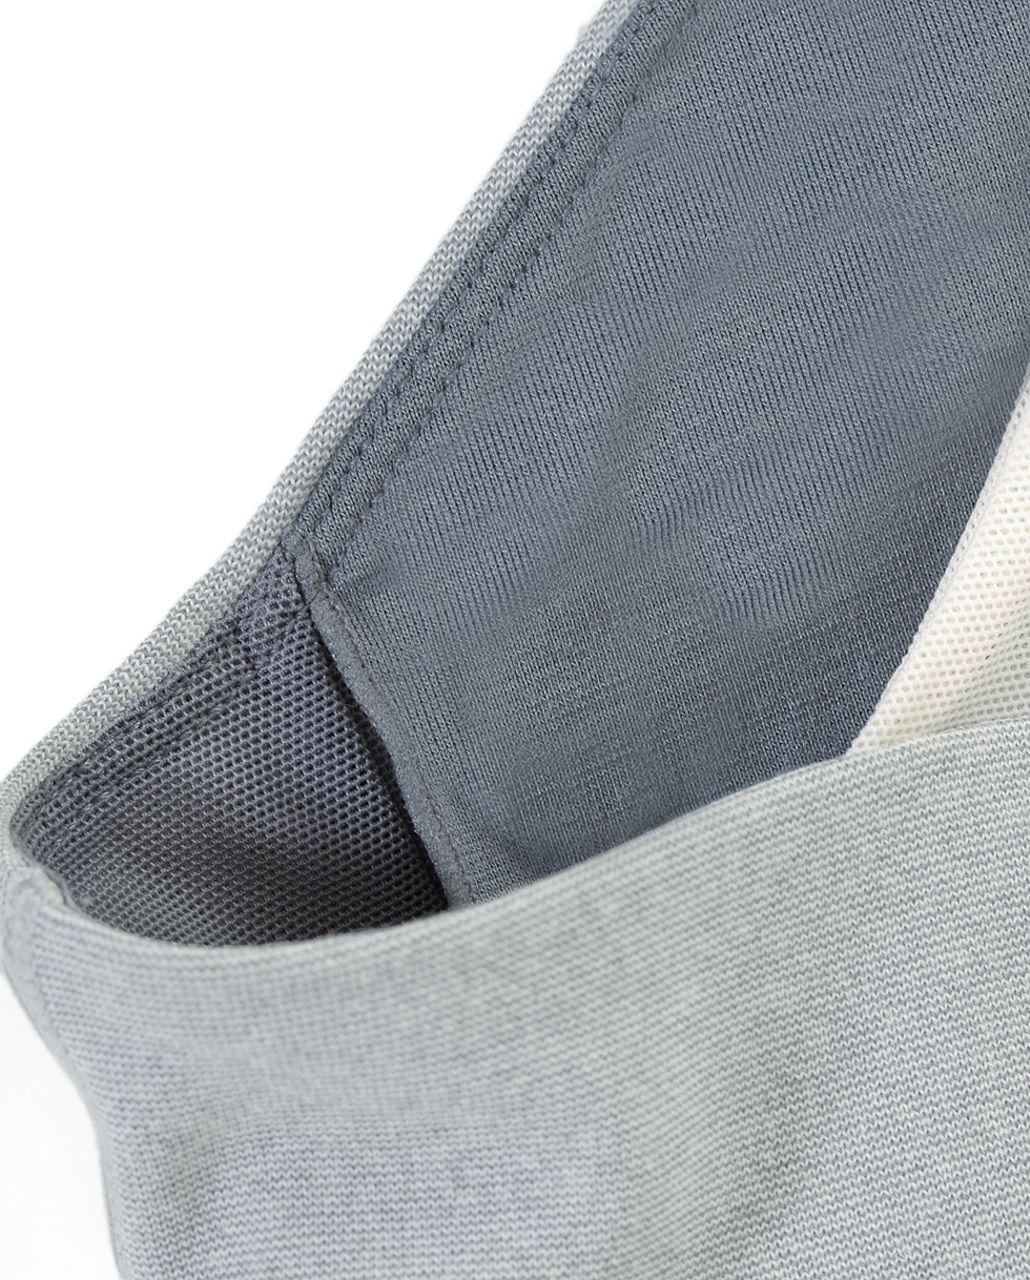 Lululemon Scoop Neck Tank - Ghost Blurred Grey Mini Stripe